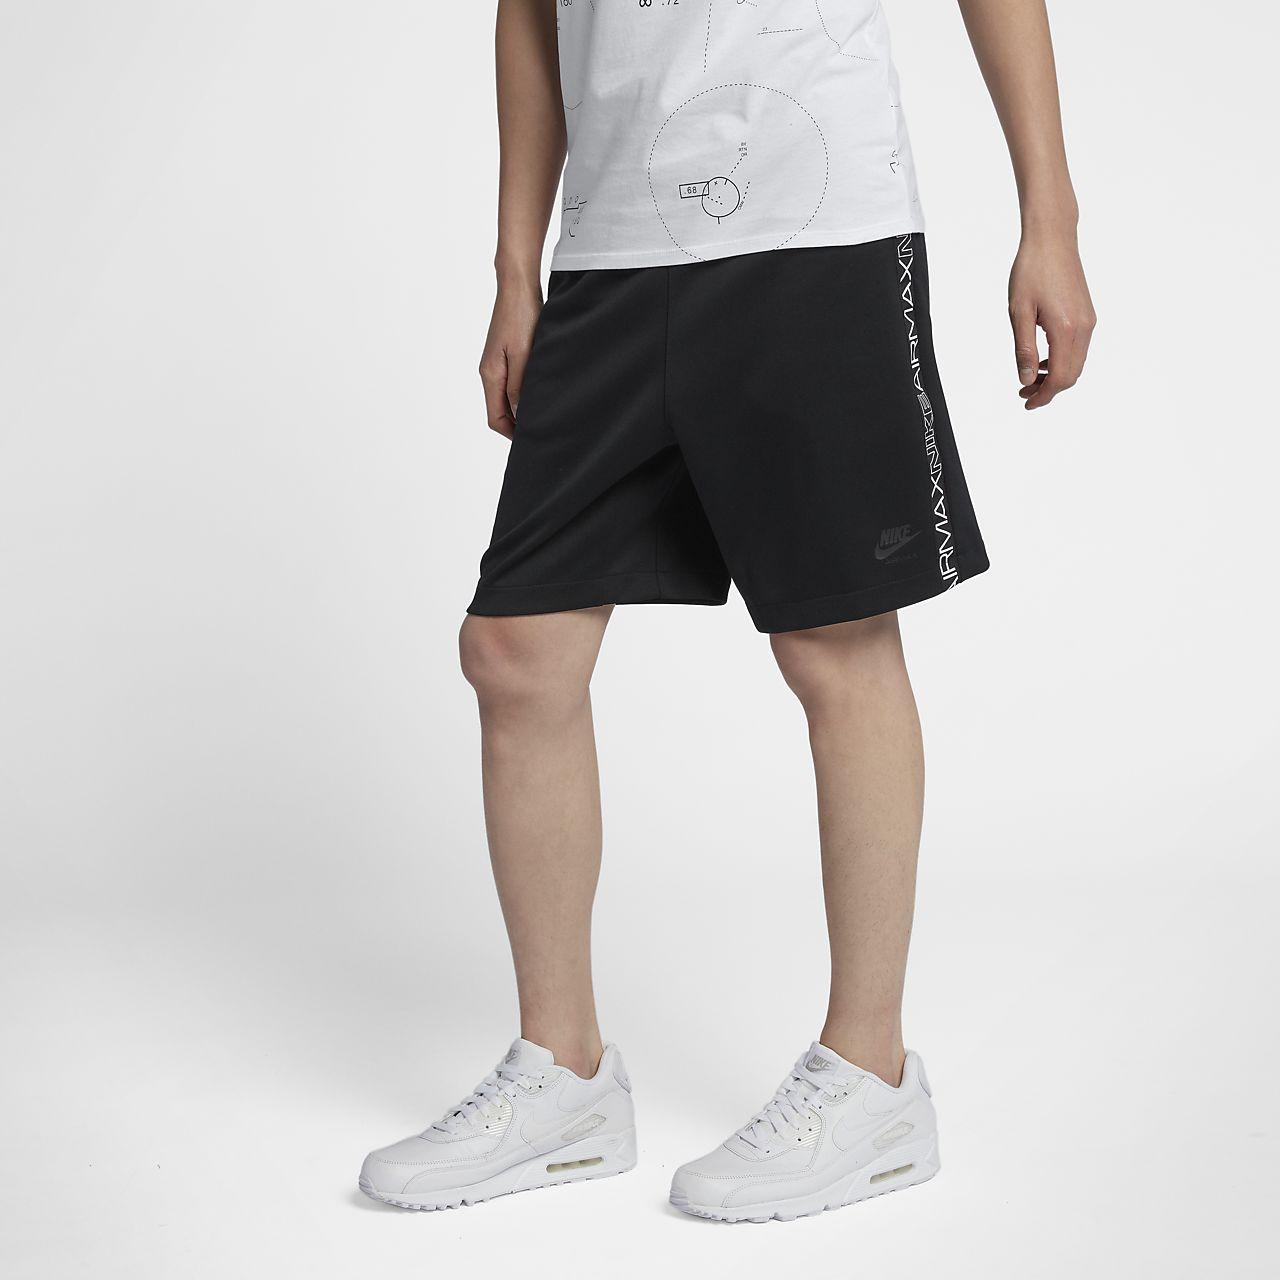 ... Nike Sportswear Air Max Men's Shorts